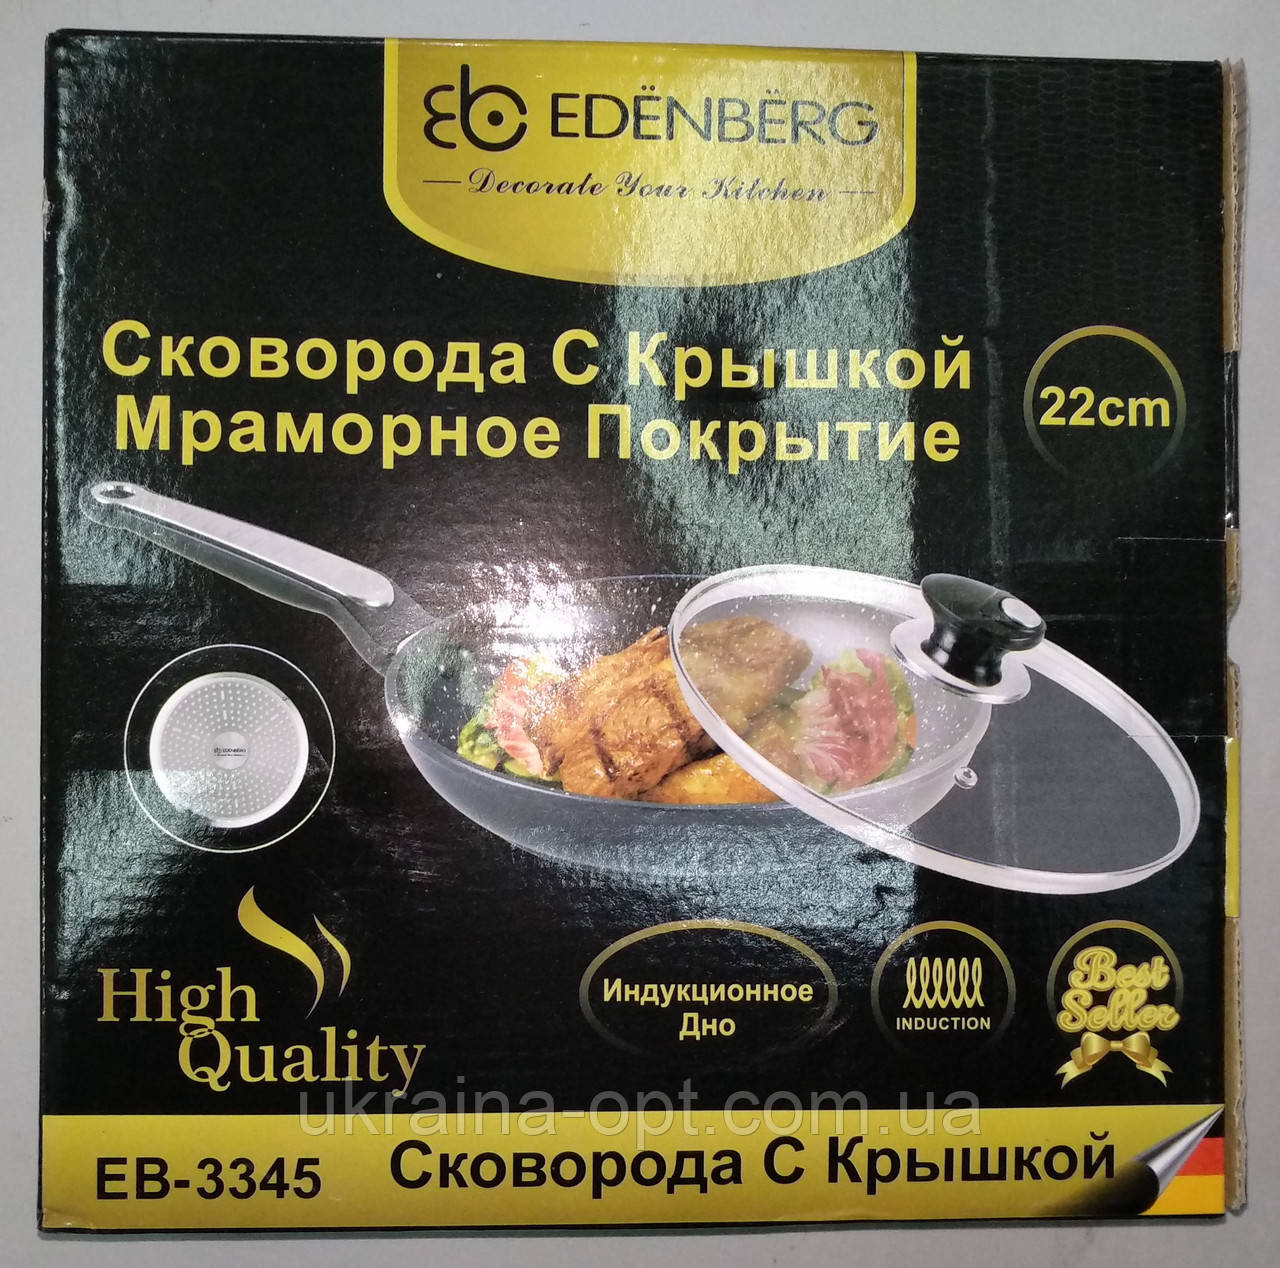 Сковорода с крышкой EDENBERG EB-3345, 22 см (мрамор)